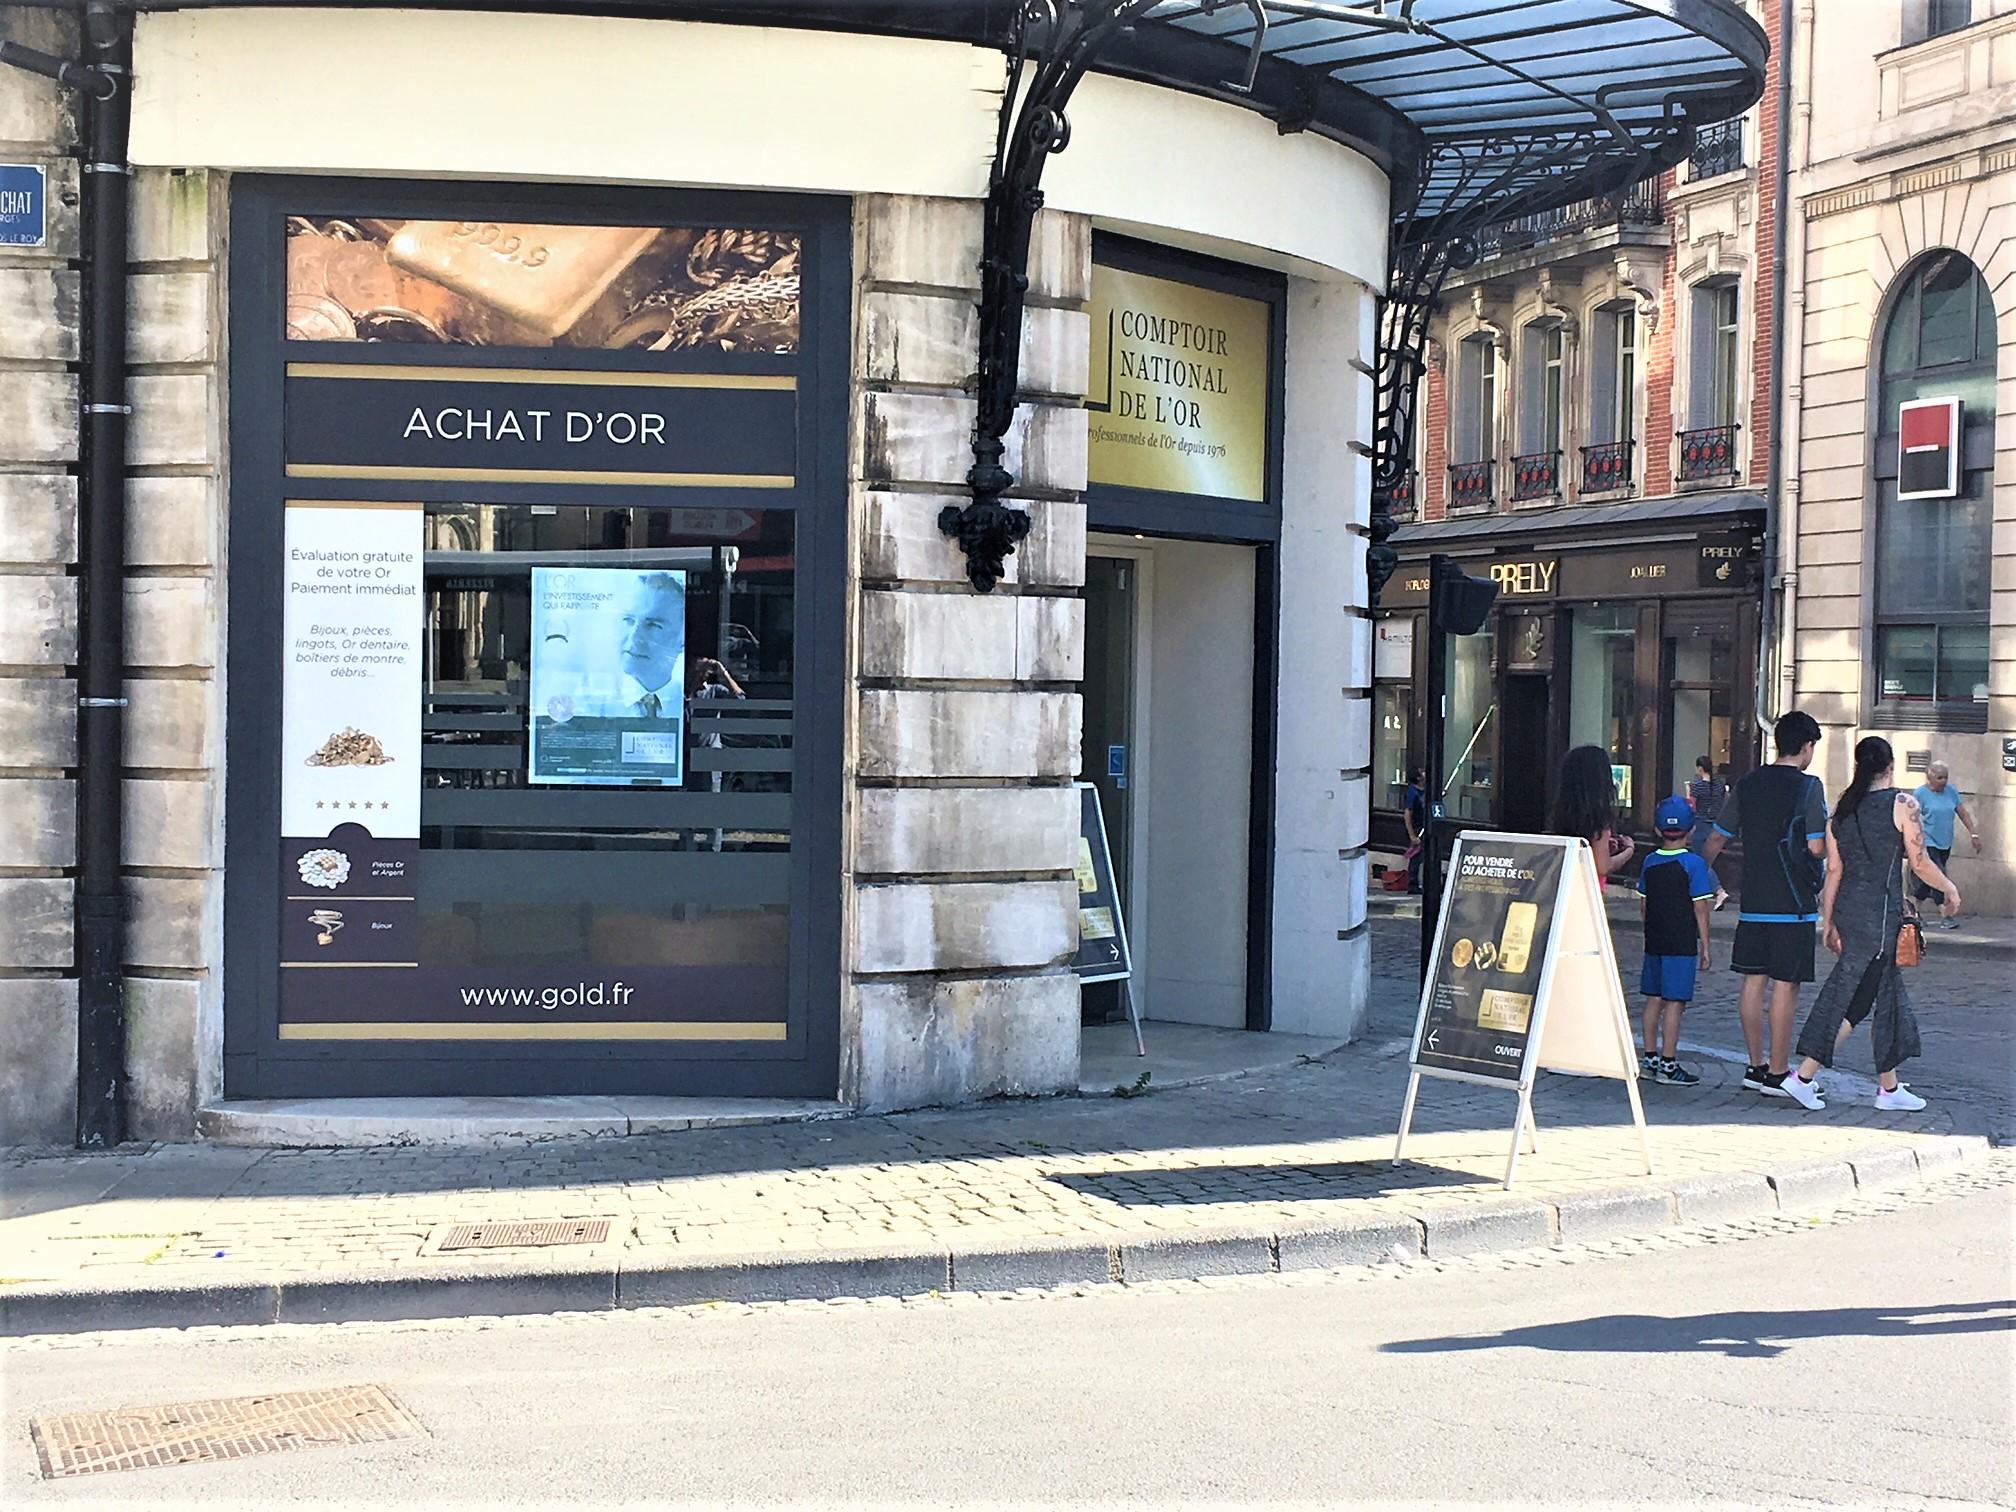 Galerie d'image - Comptoir National de l'Or - Agence de Bourges - SARL SELENIA